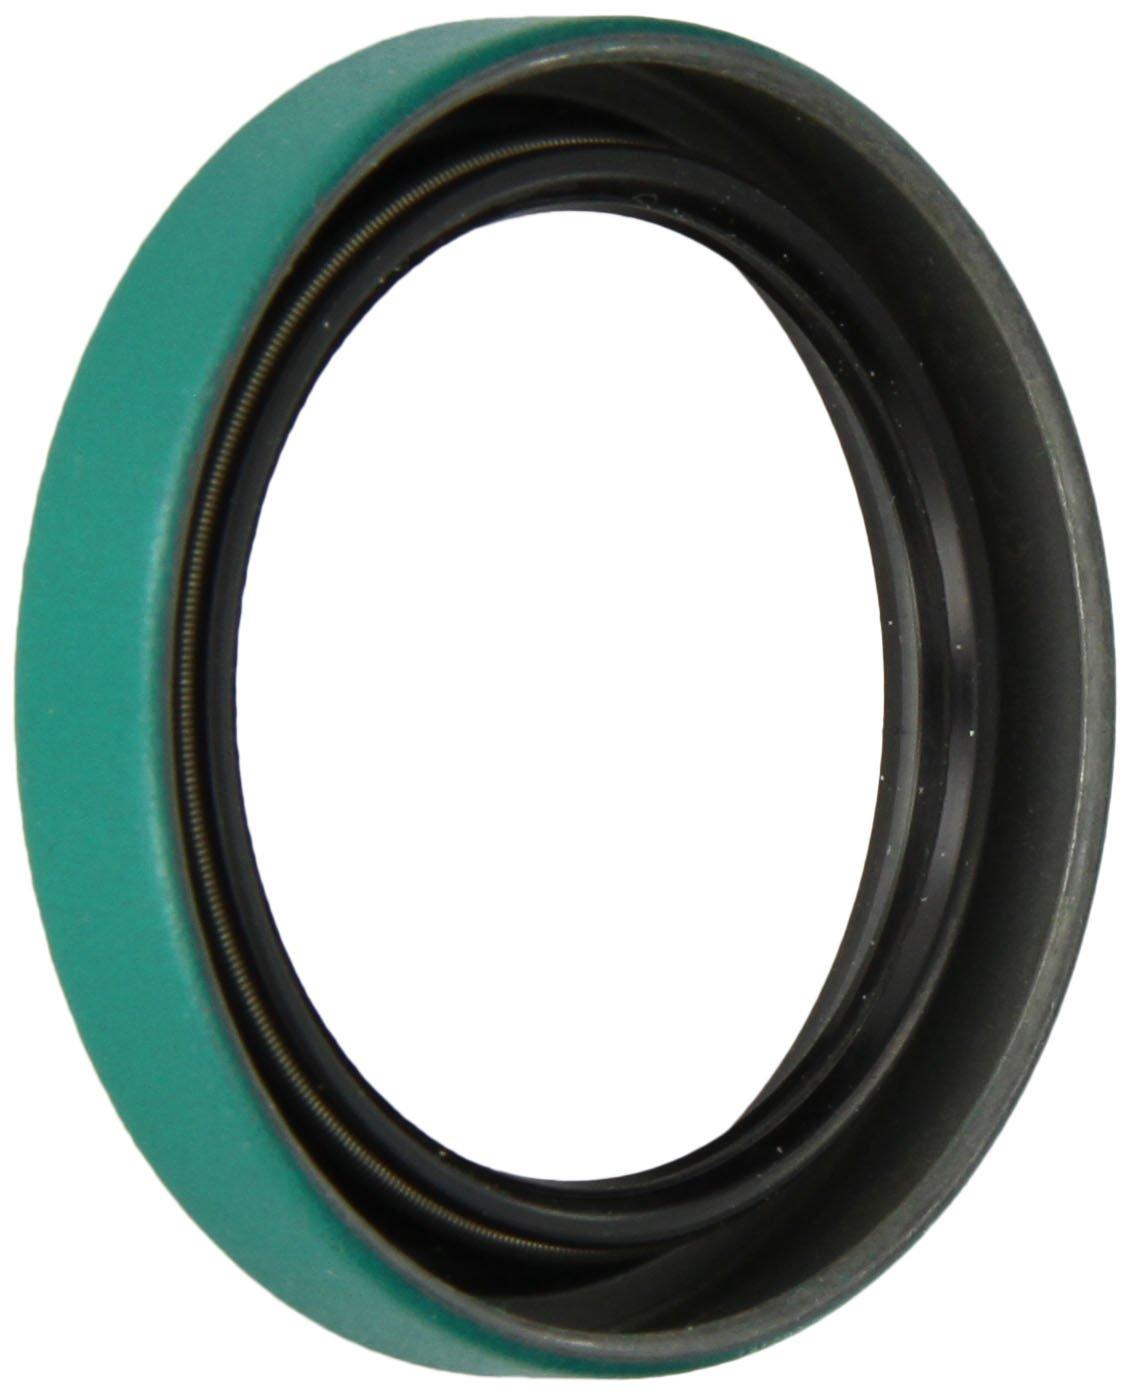 1.5 Shaft Diameter 2 Bore Diameter CRW1 Style SKF 14855 LDS /& Small Bore Seal R Lip Code Inch 0.313 Width